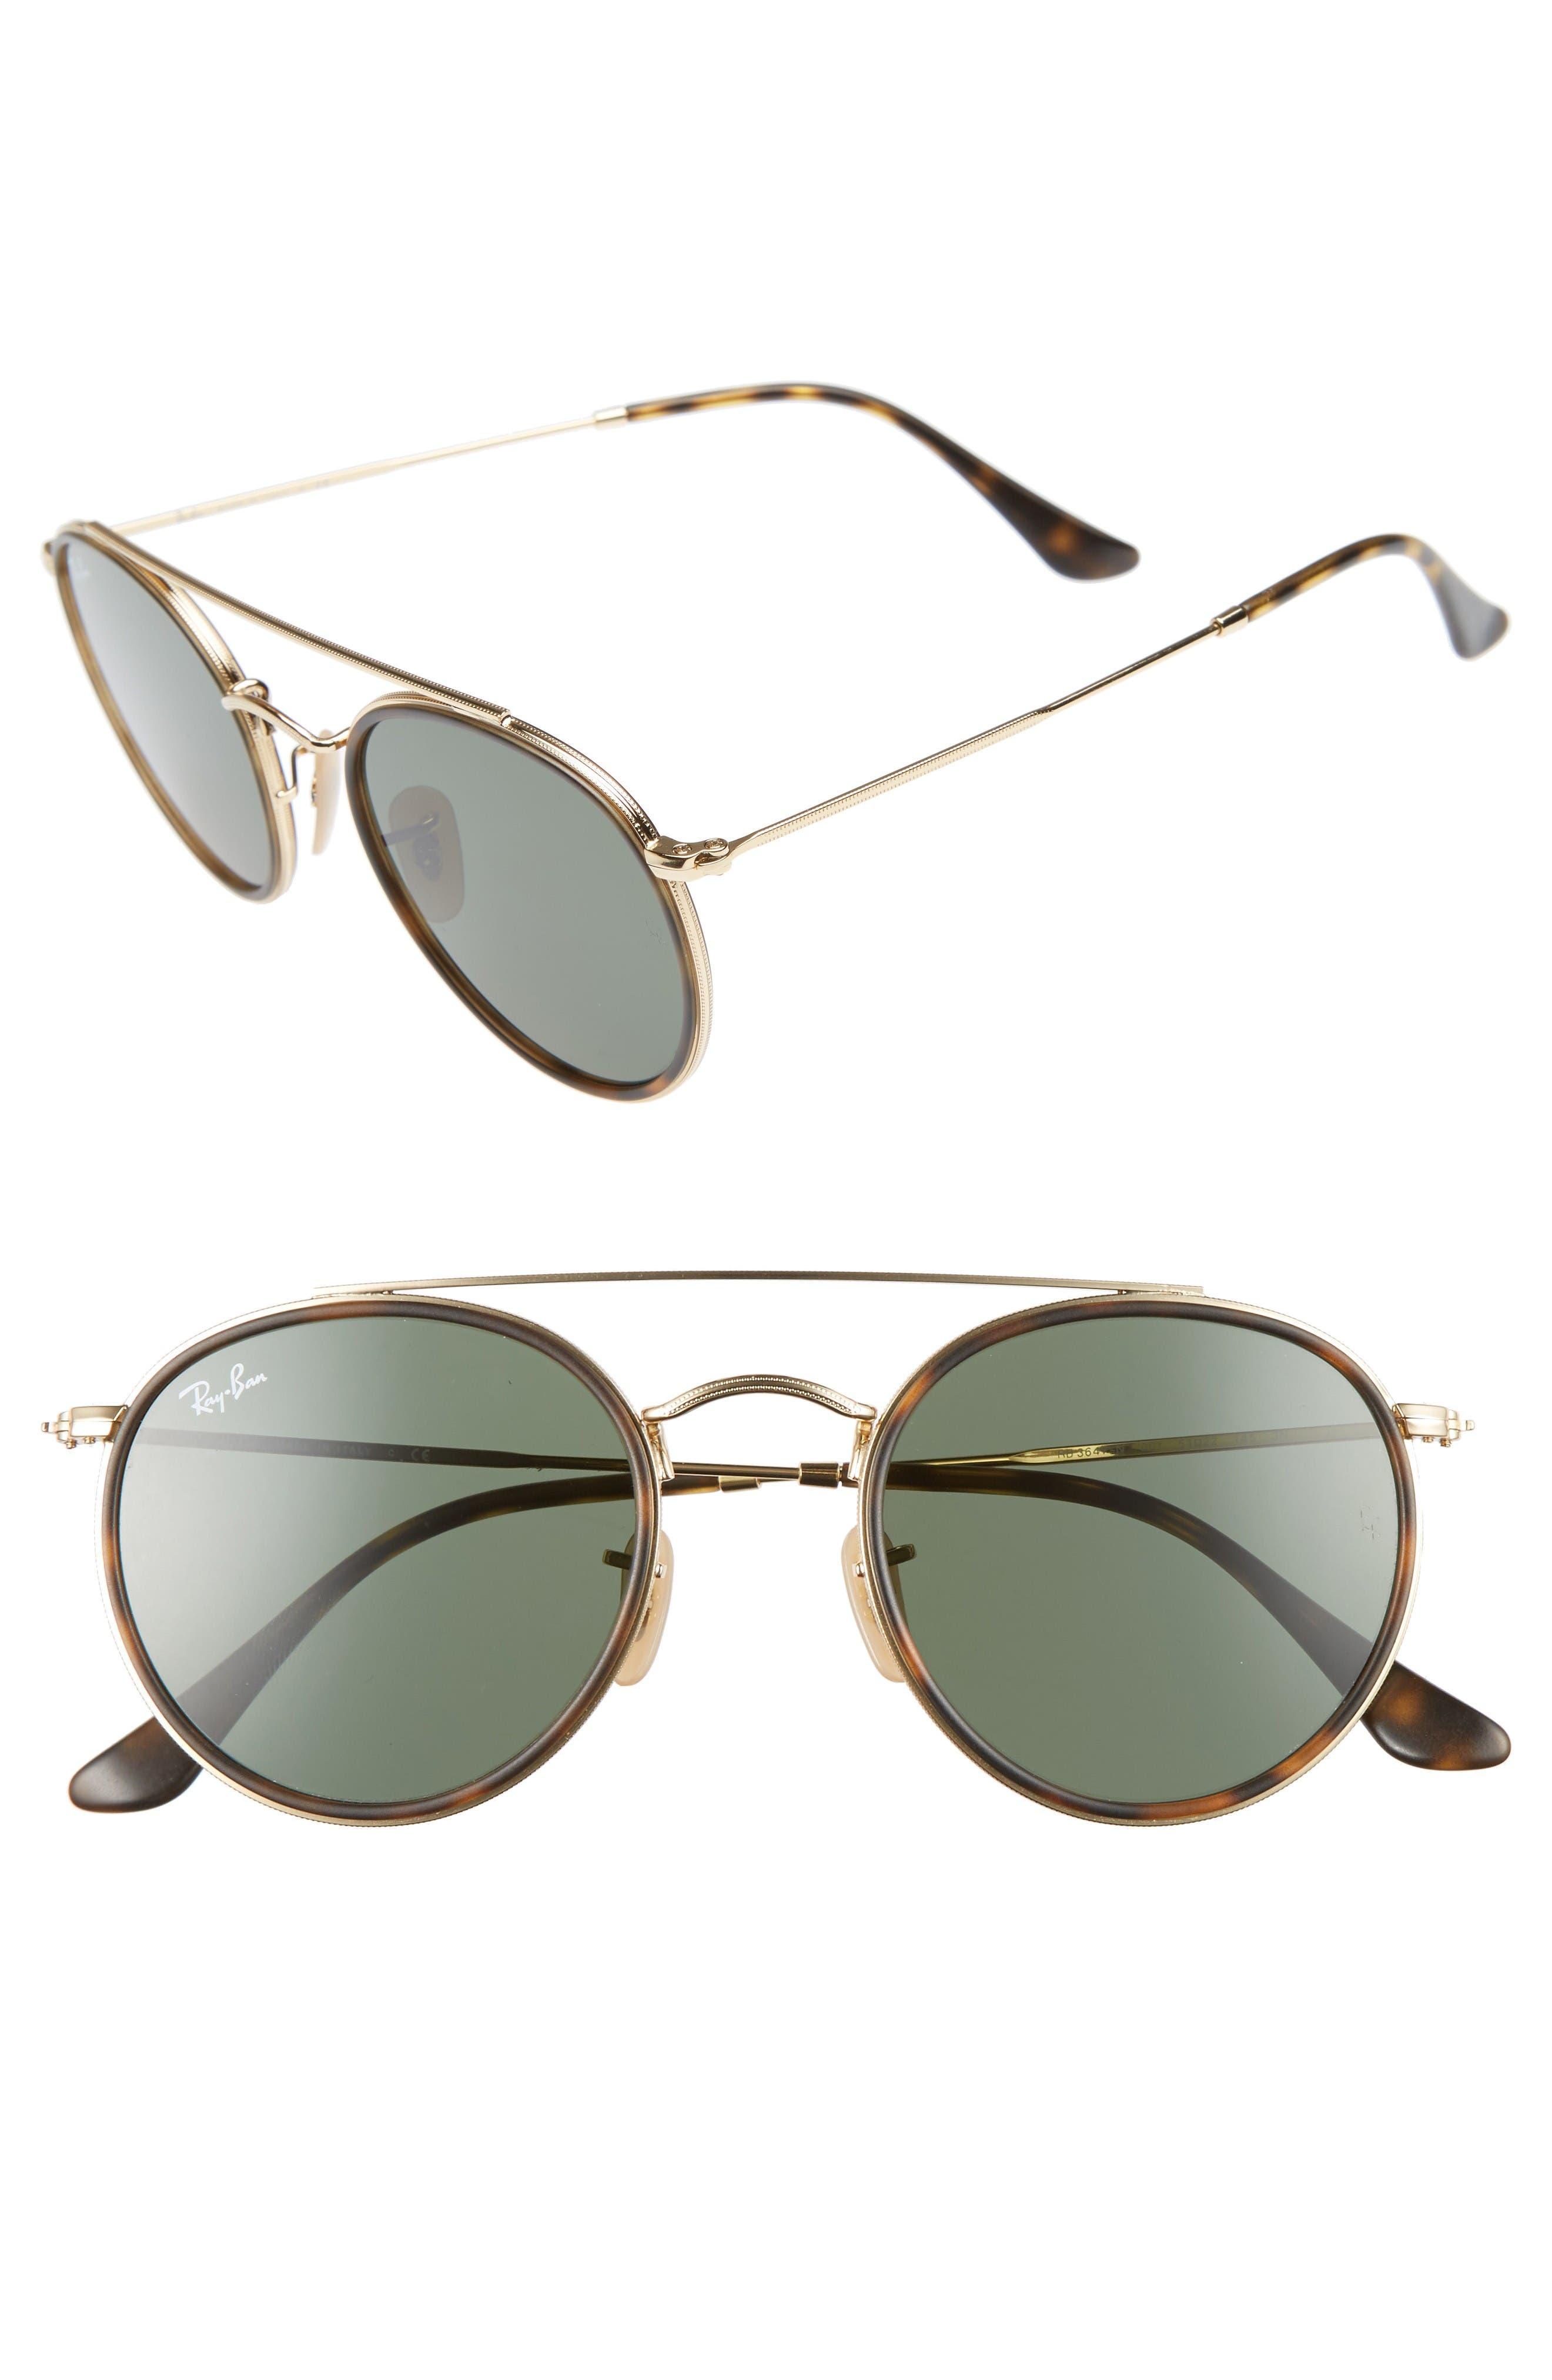 51mm Aviator Sunglasses,                         Main,                         color, Gold/ Green